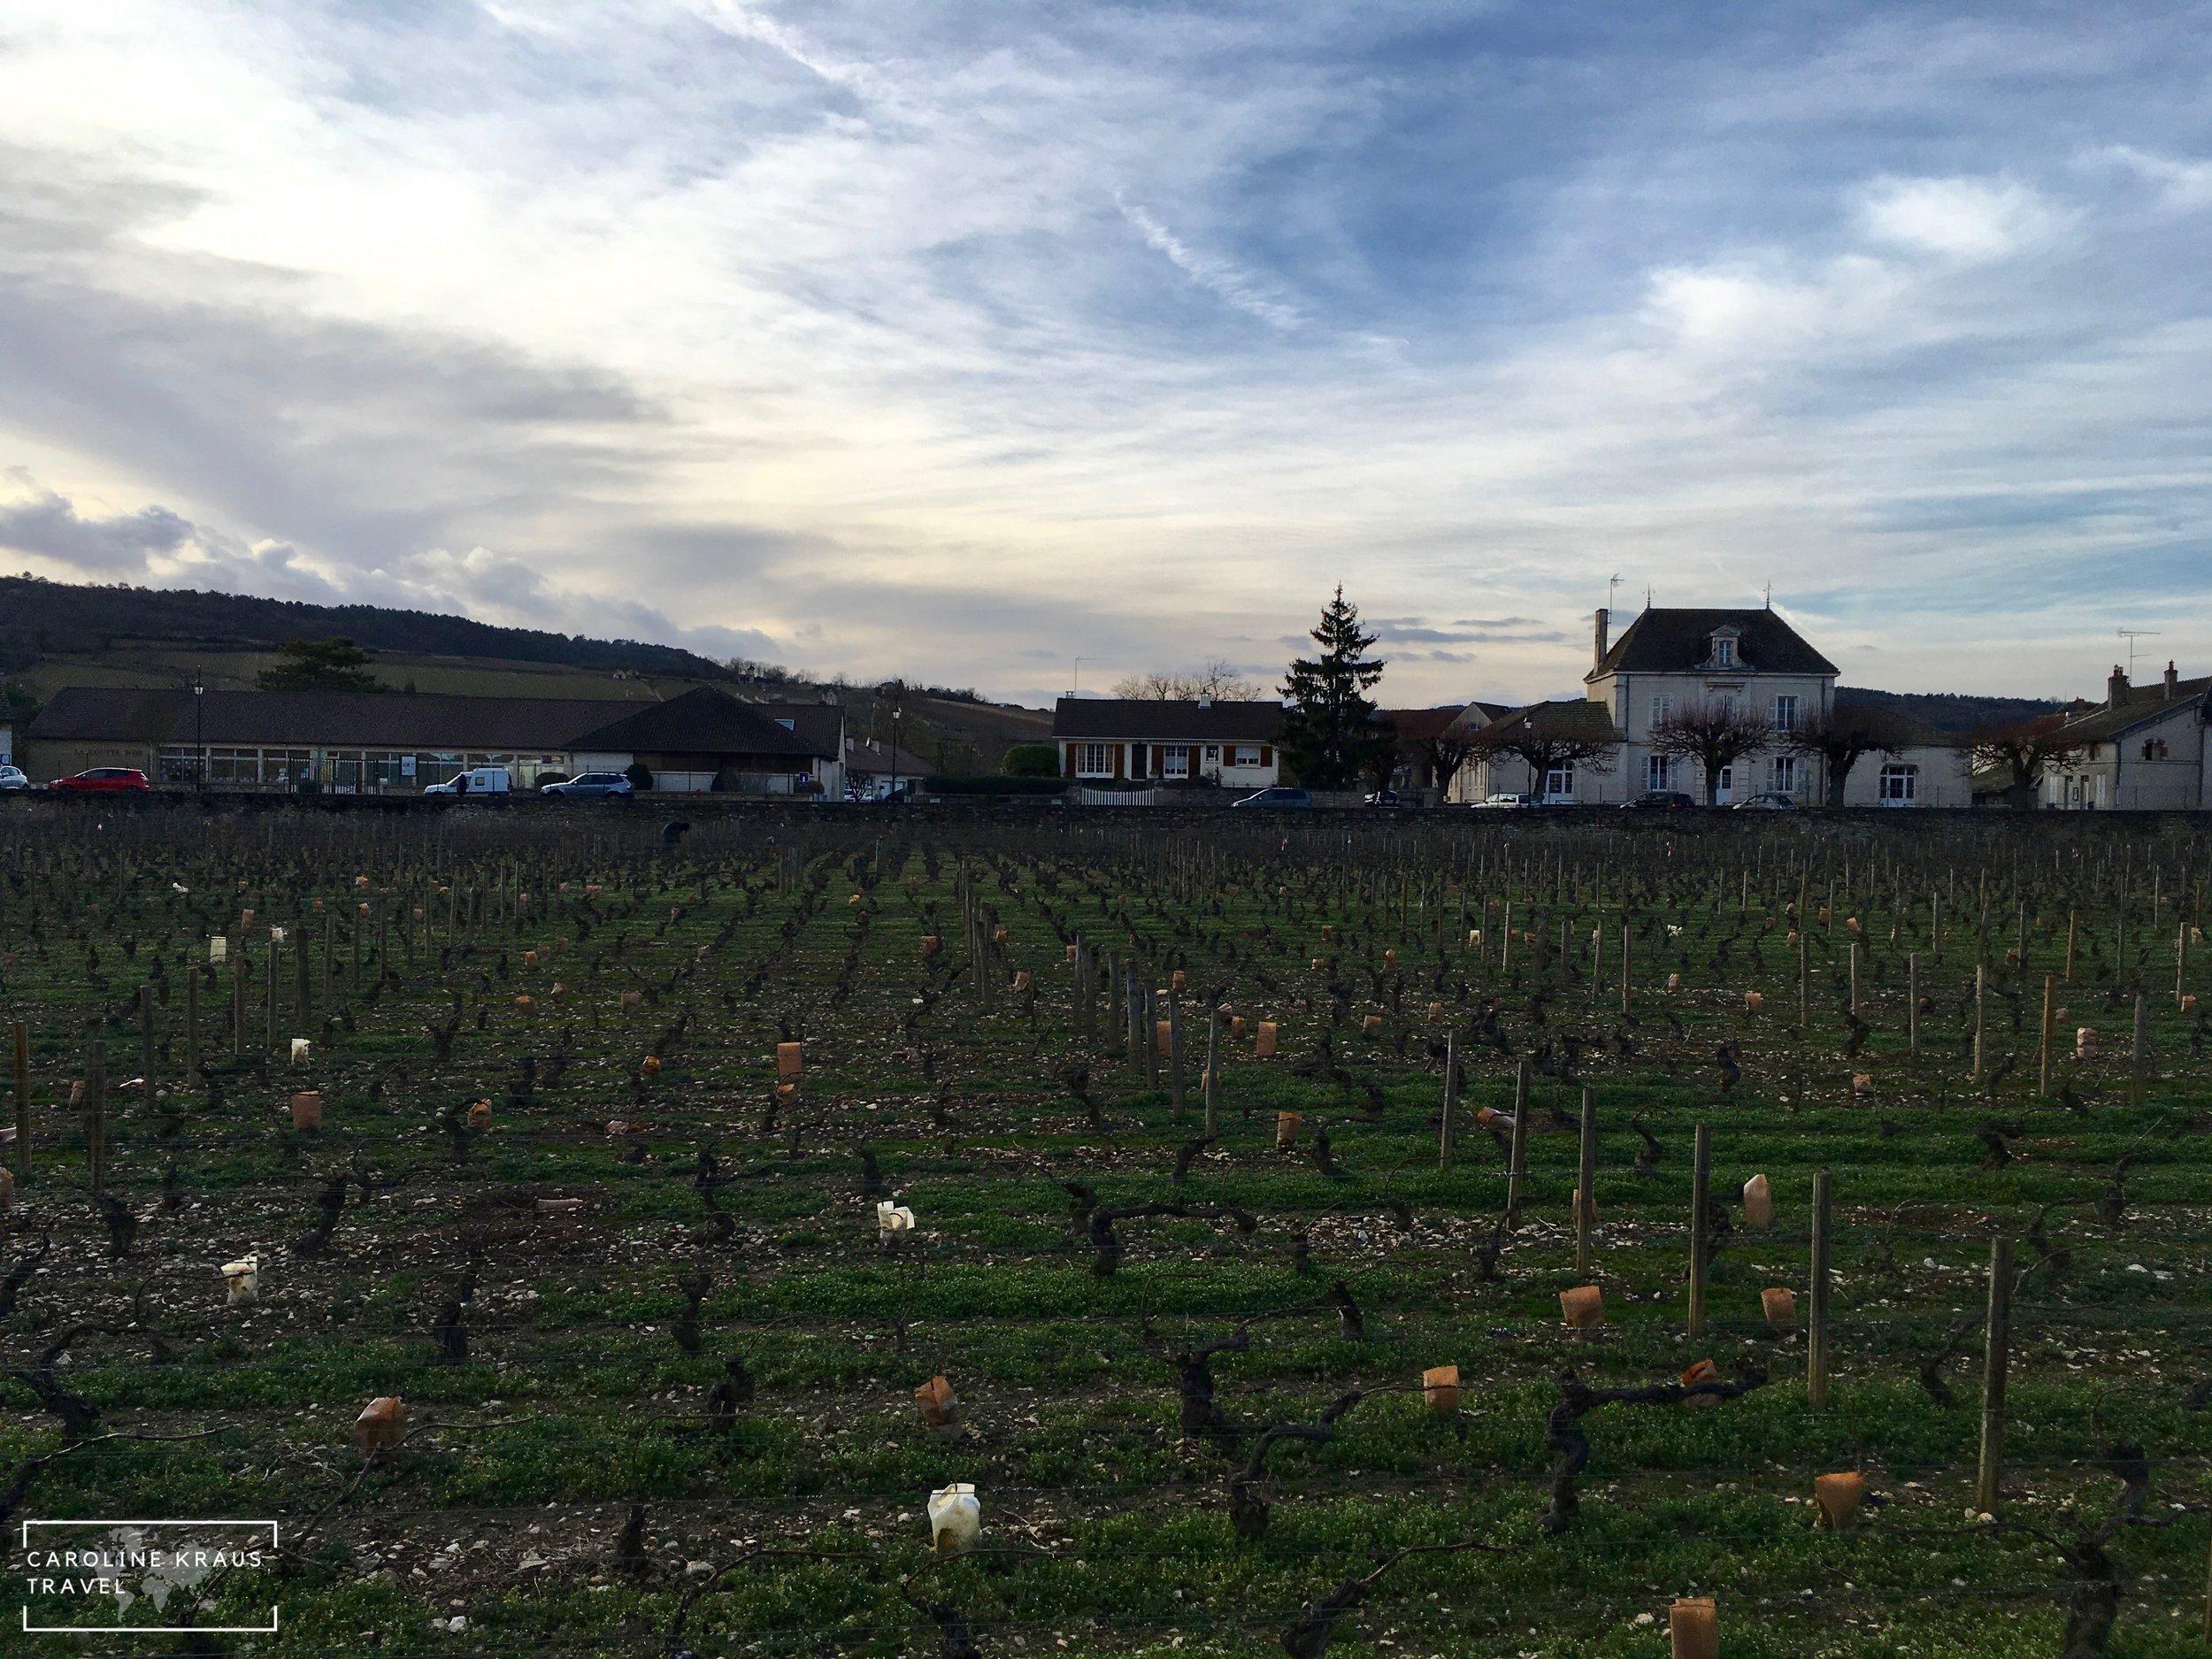 Vineyards in Meursault